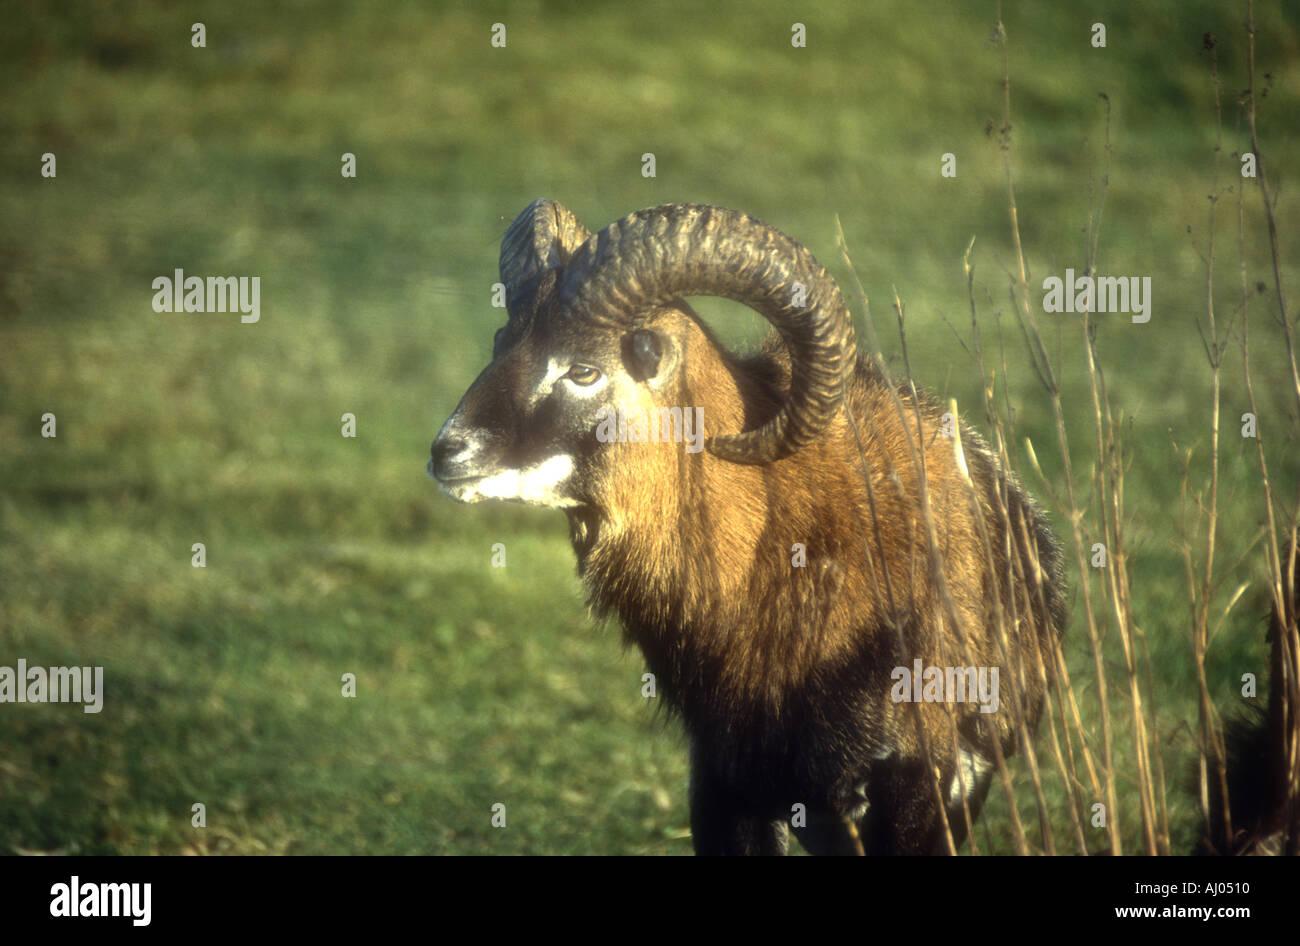 Soay Sheep of St Kilda Scotland - Stock Image